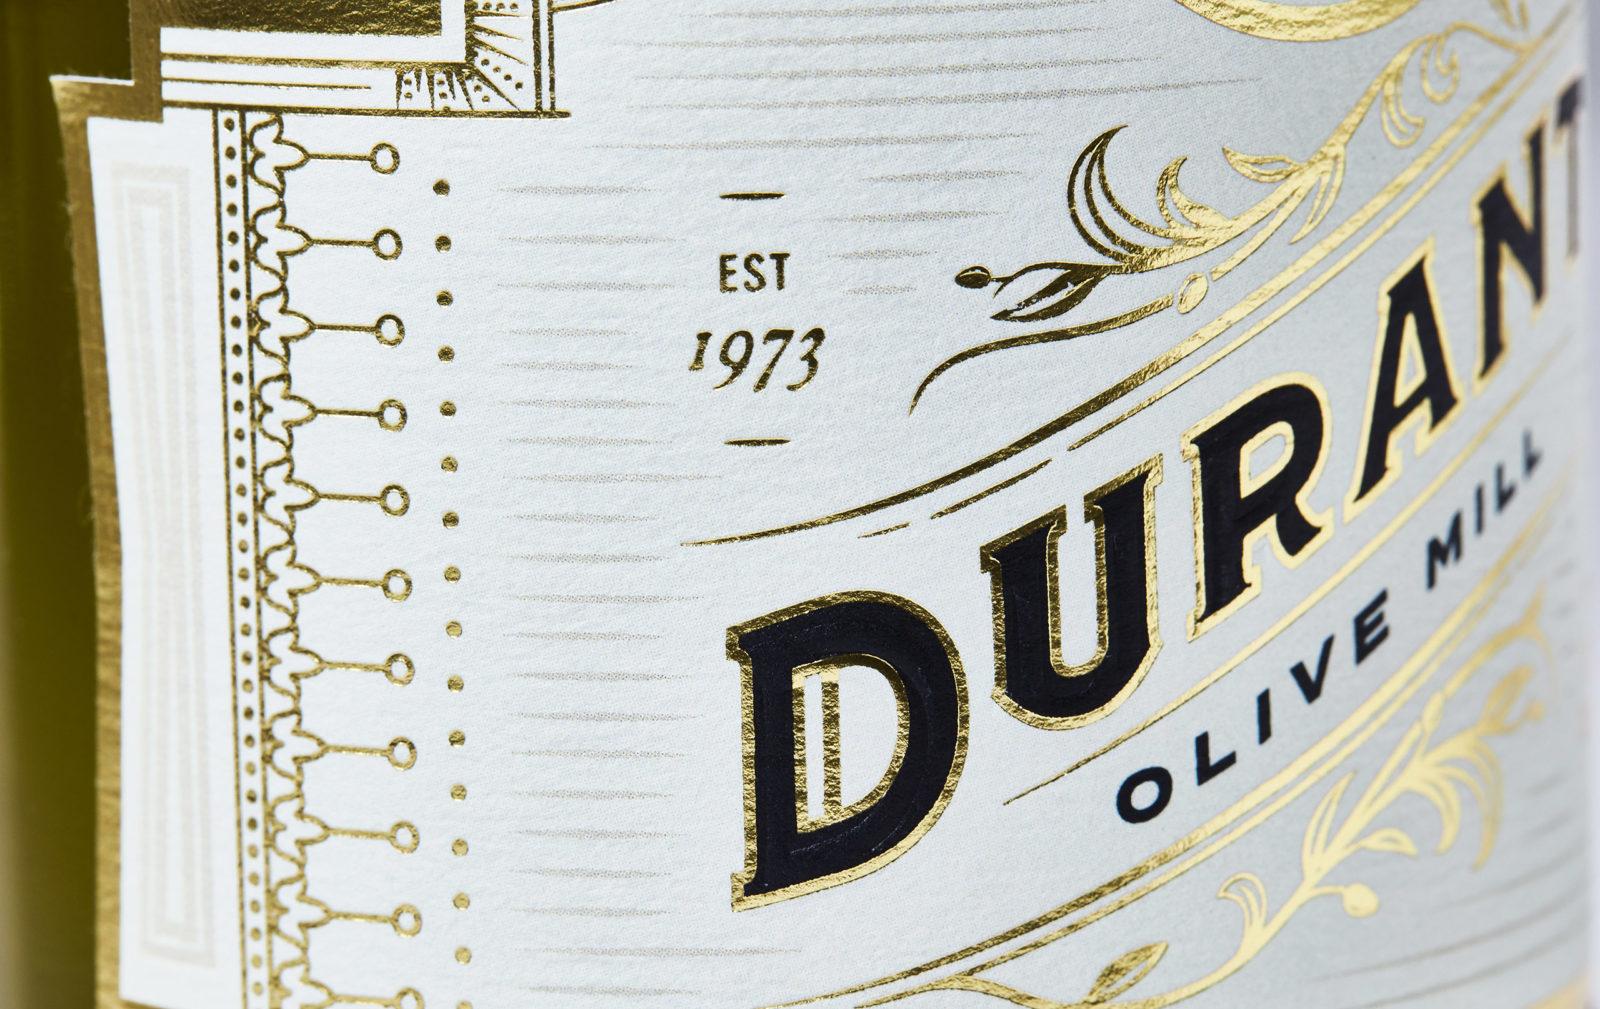 Detail of Durant Olive Oil label